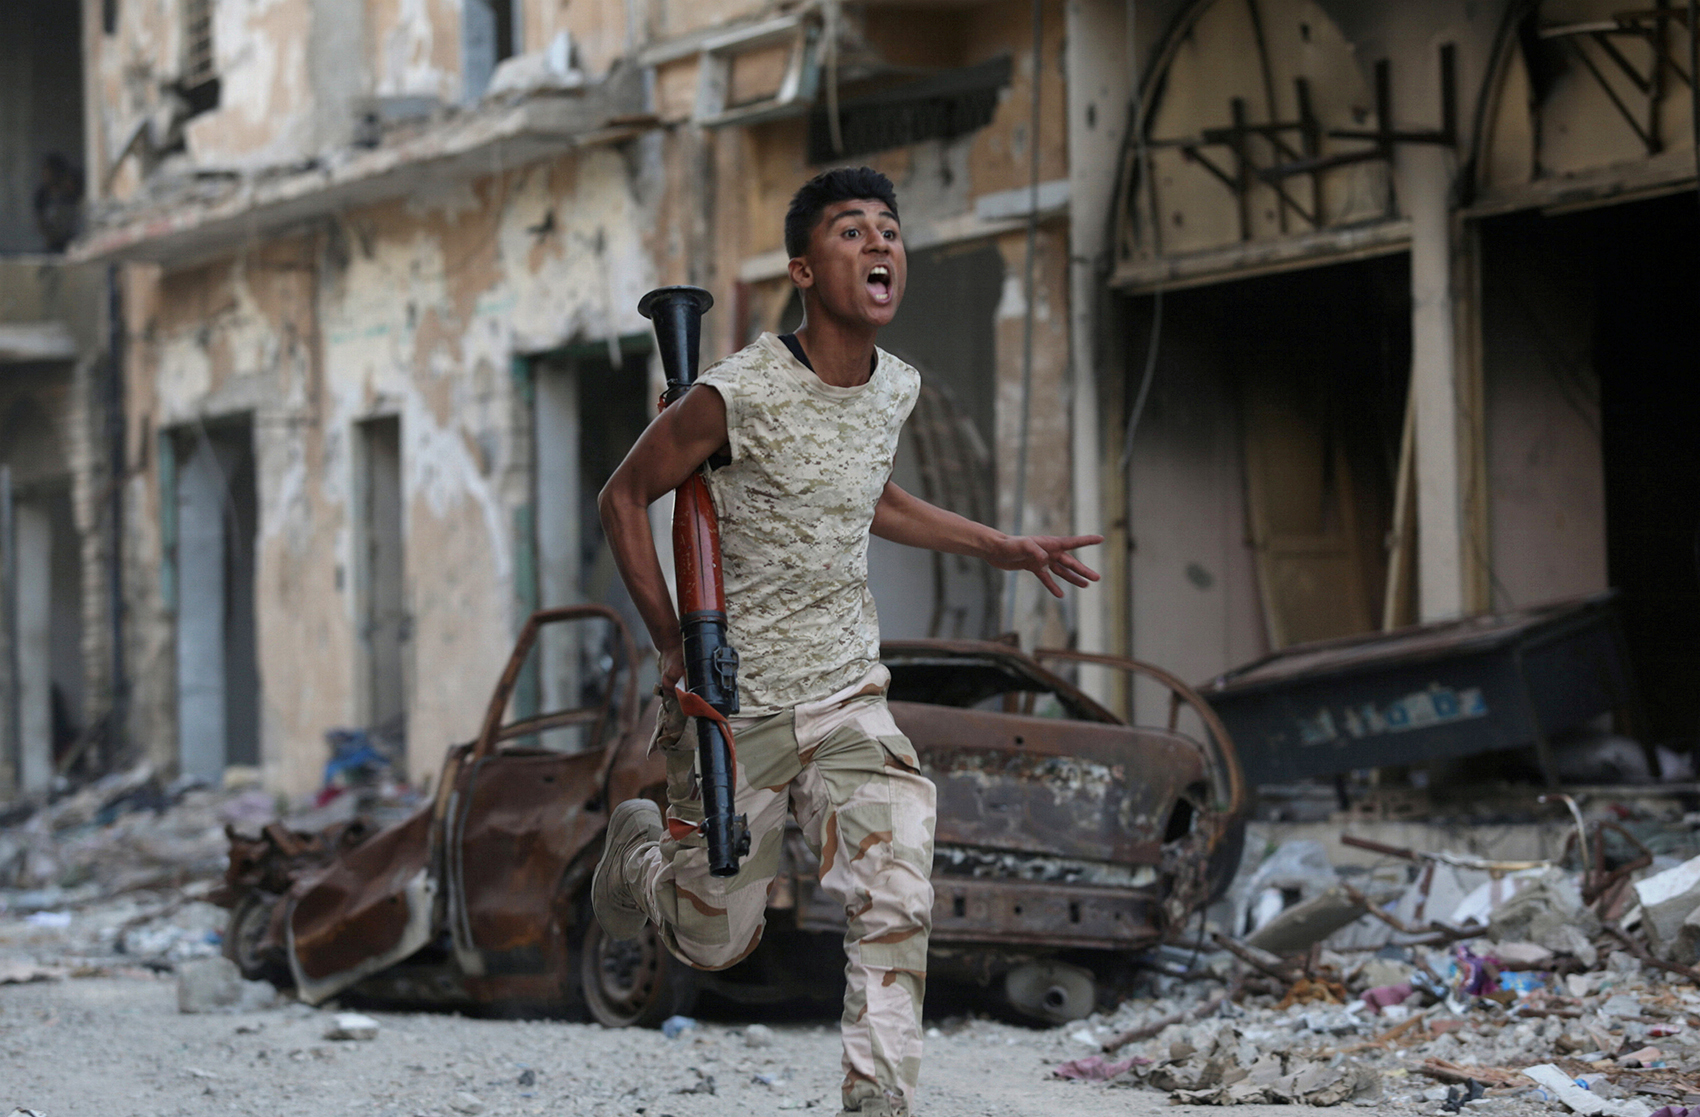 https://microsites-live-backend.cfr.org/cdn/ff/c-TcX3_Q48L-fH0tlP_ljgJM3Jkn5Uh2CB-UrHknQl8/1590661141/public/2019-07/RTS1J9GS_Libya_Khreibish_clashes.jpg